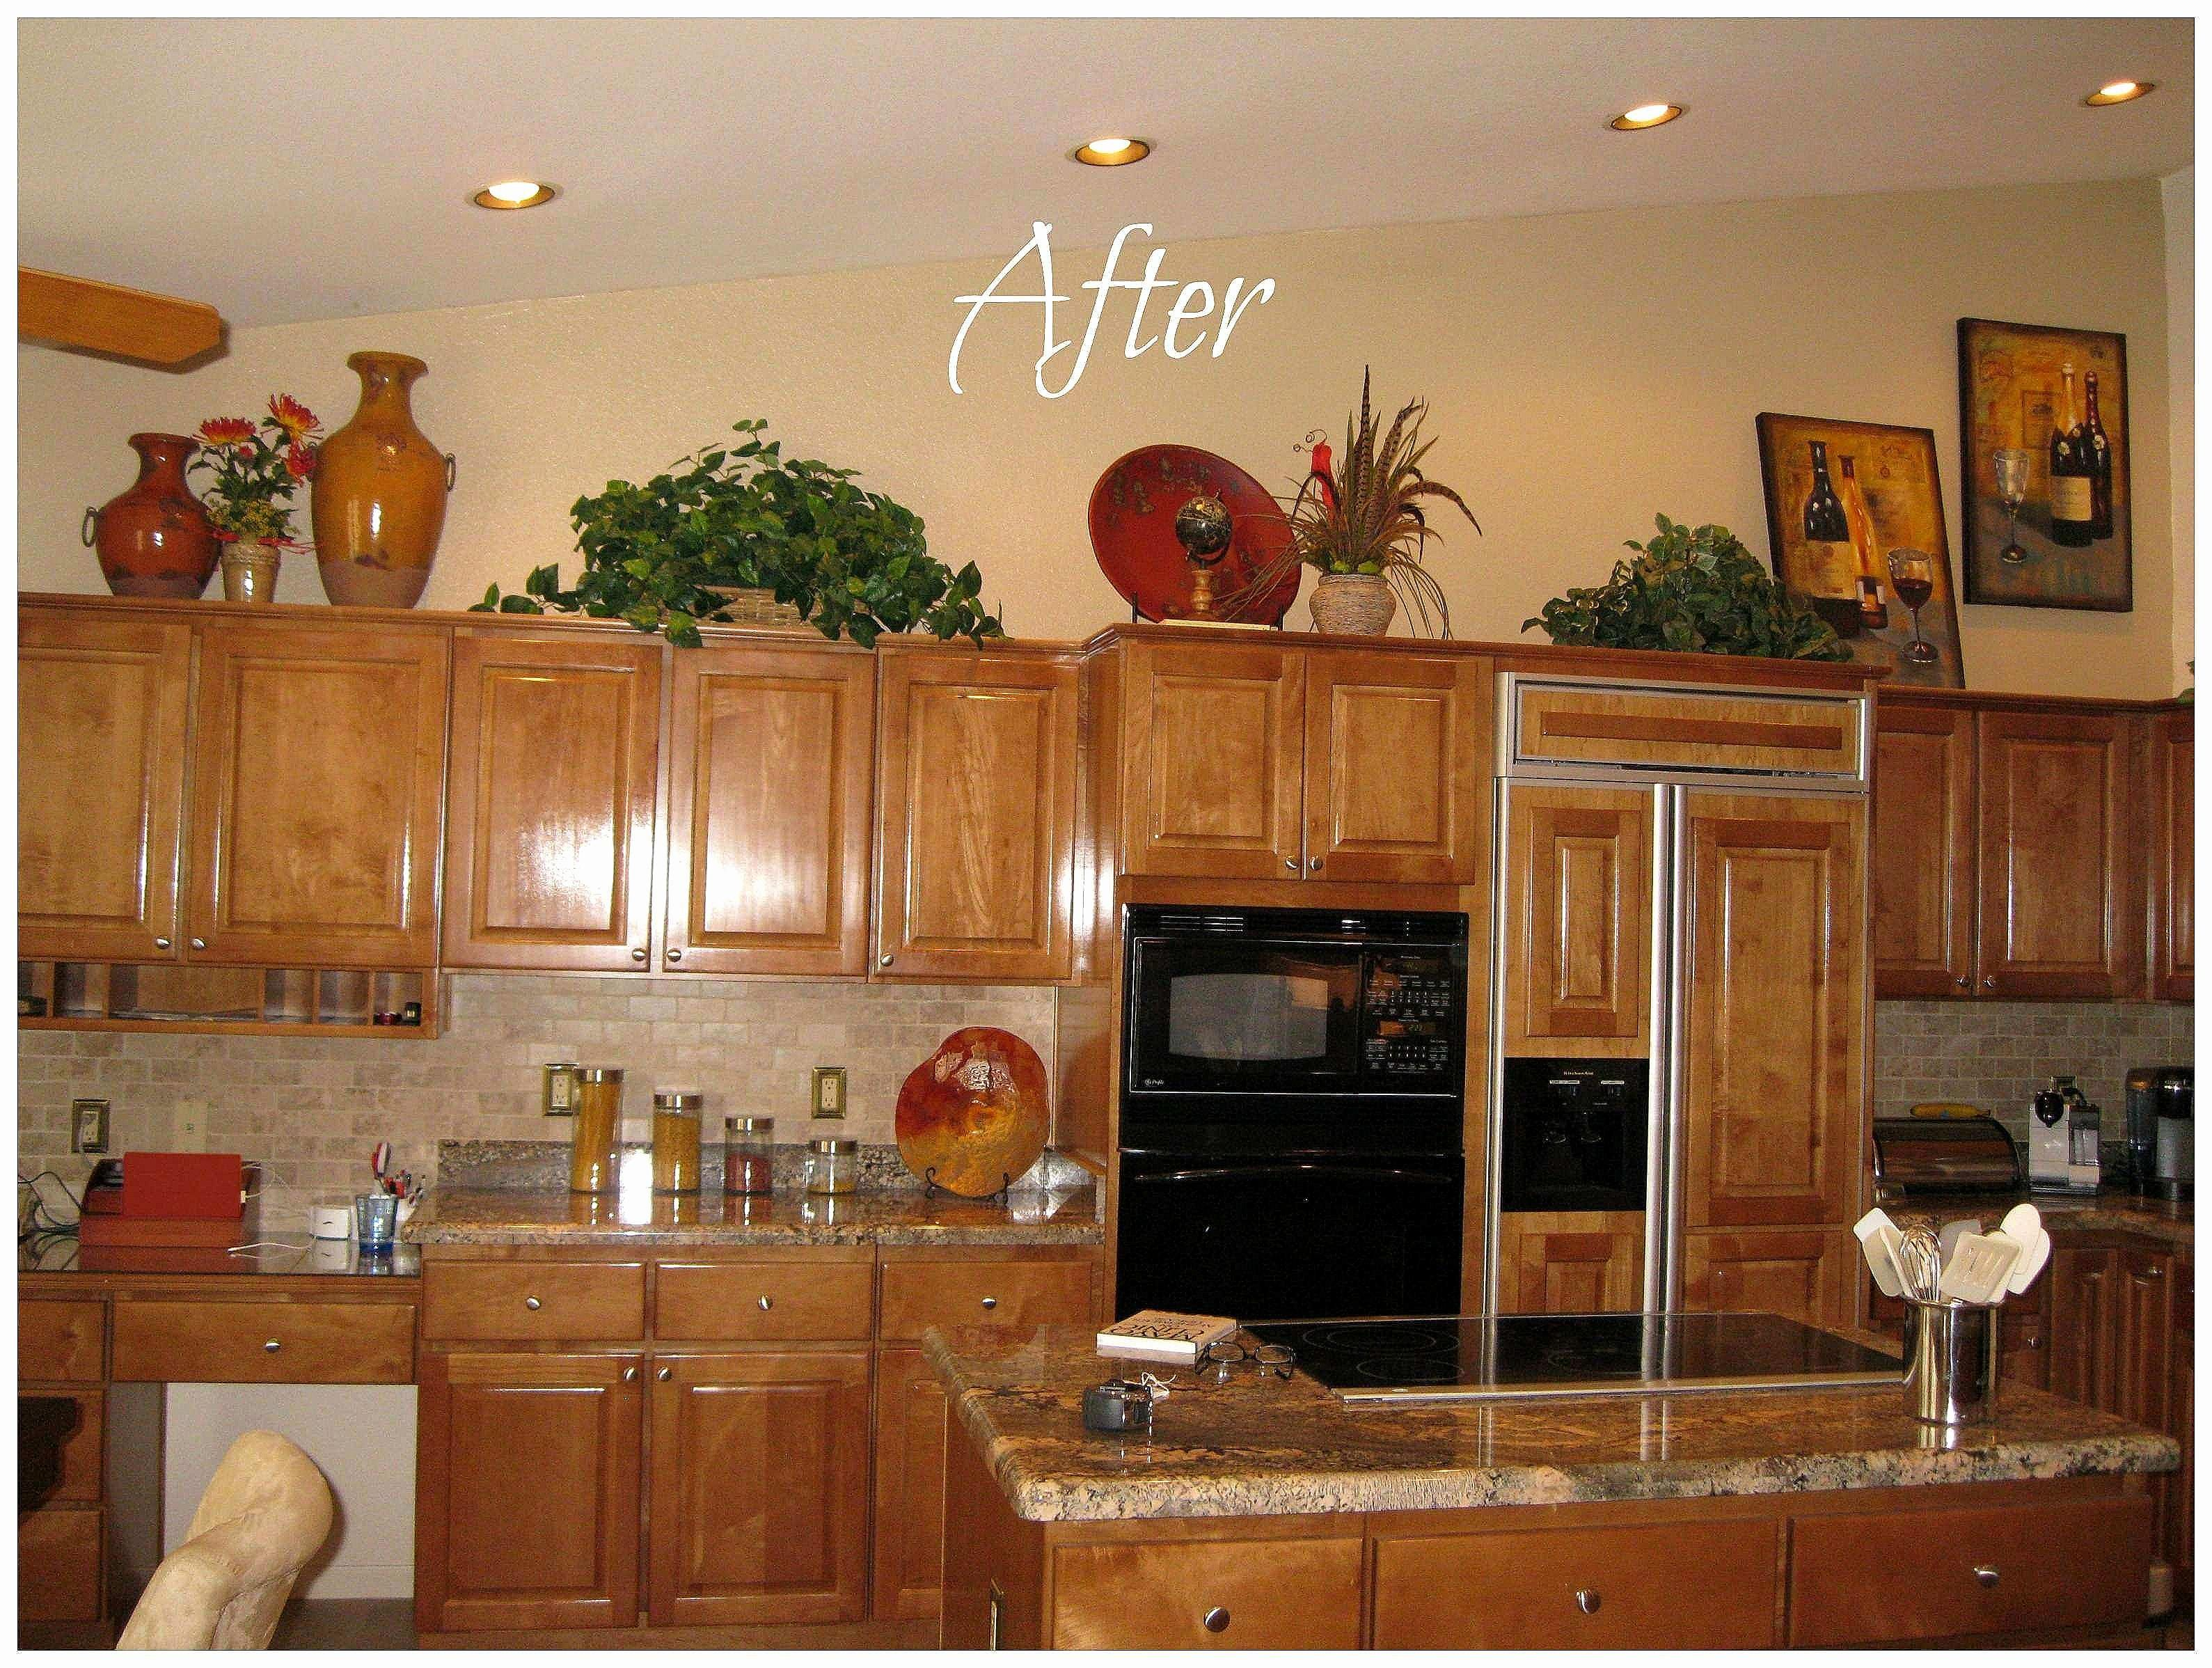 Elegant Apple Kitchen Decor -  Decorating above kitchen cabinets